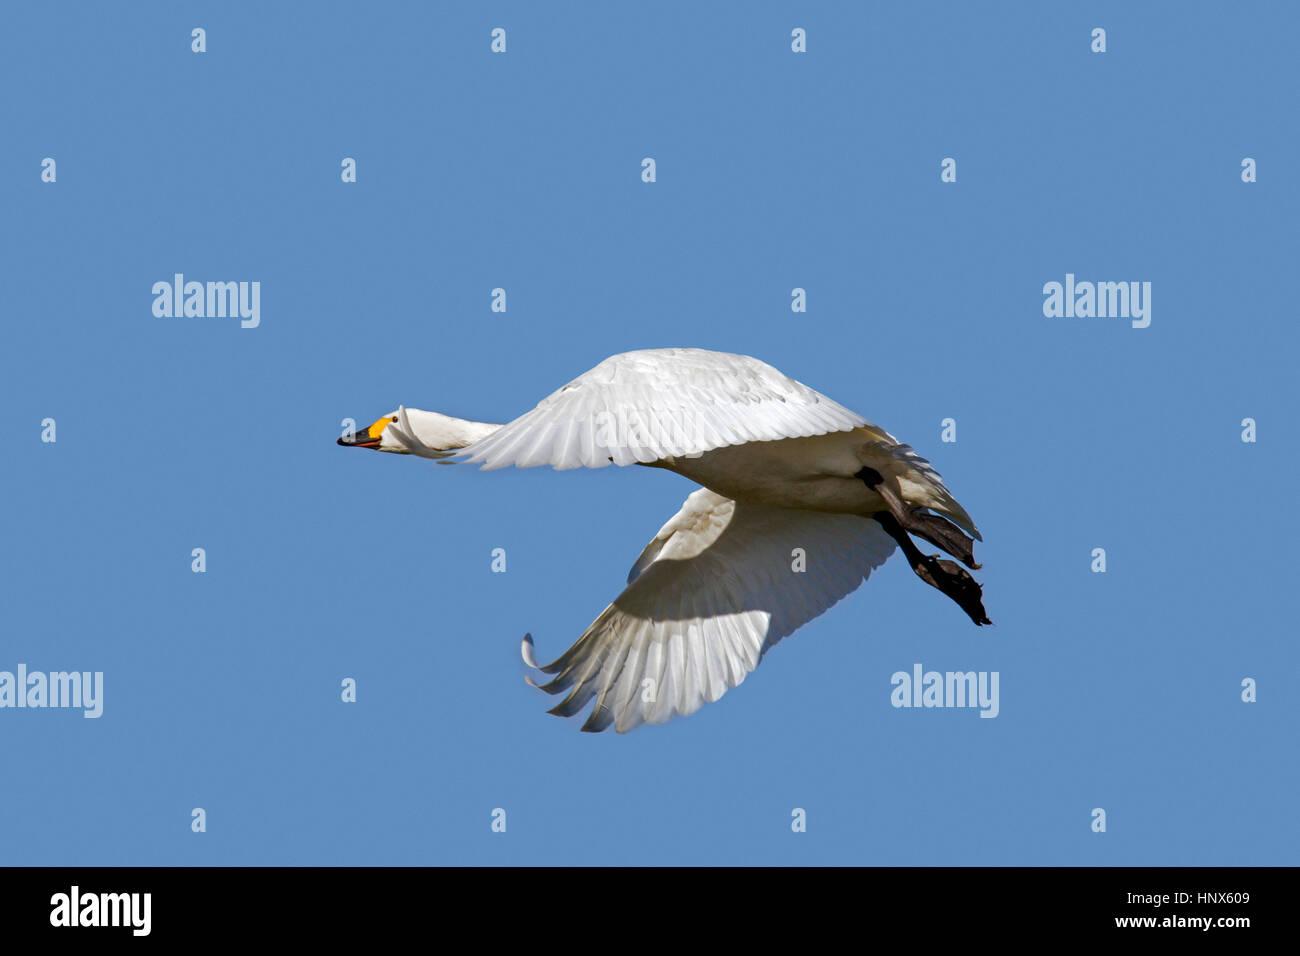 Tundra swan (Cygnus columbianus) / Bewick's swan (Cygnus bewickii) in flight against blue sky Stock Photo